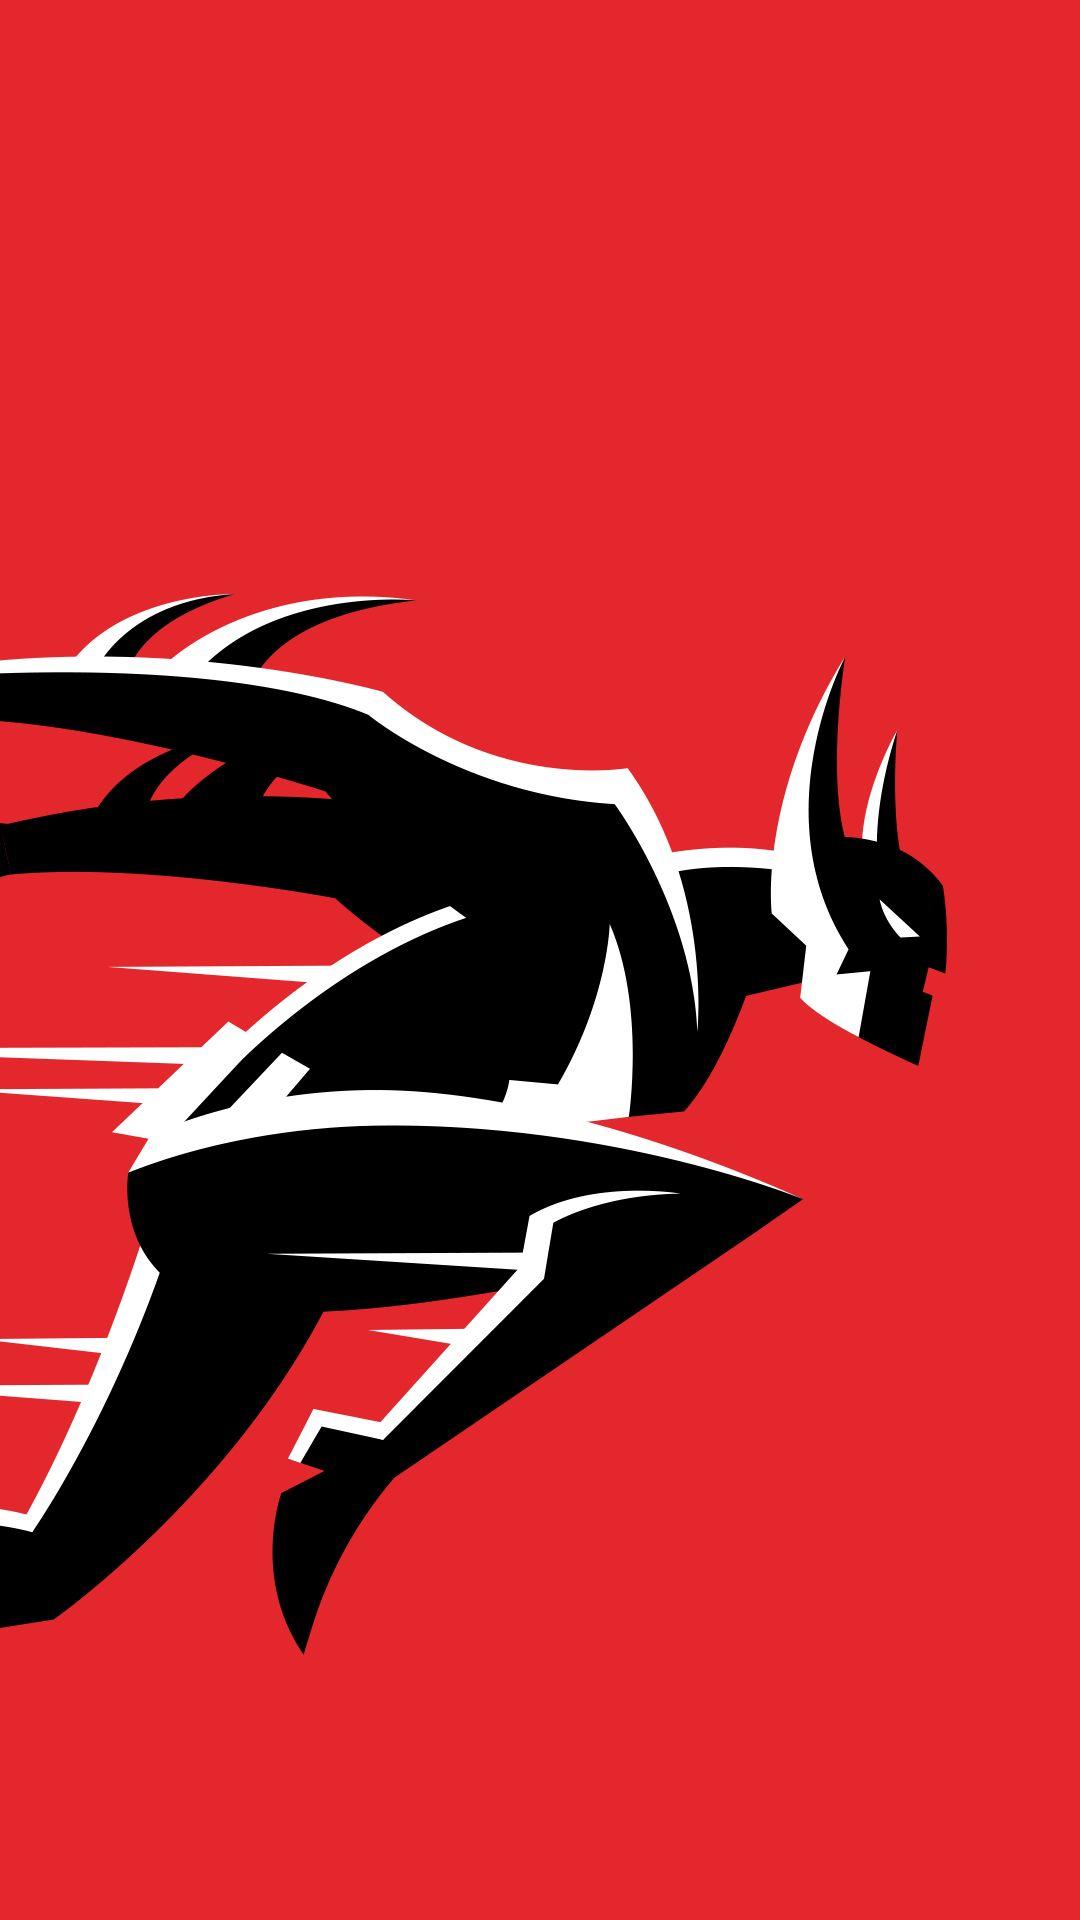 Batman galaxy s7 wallpaper (с изображениями) Супергерои